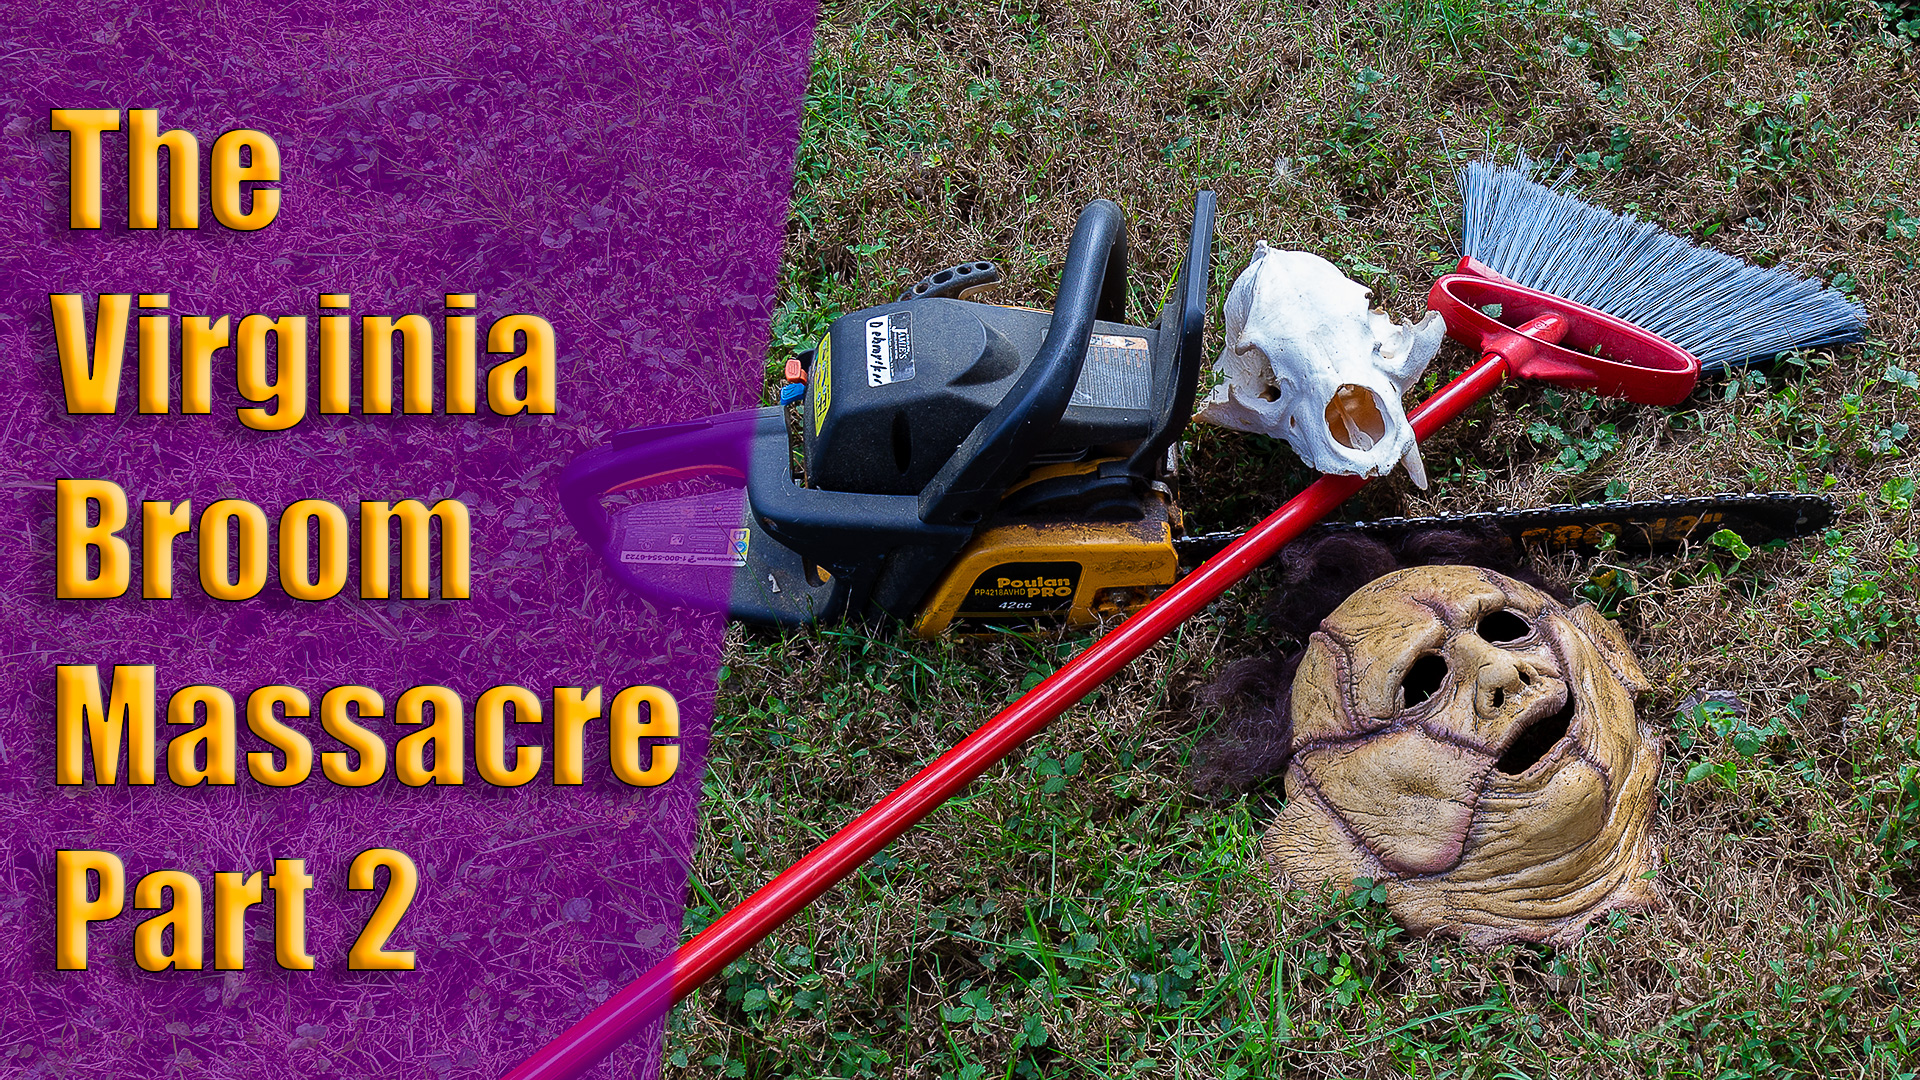 The Virginia Broom Massacre Part 2